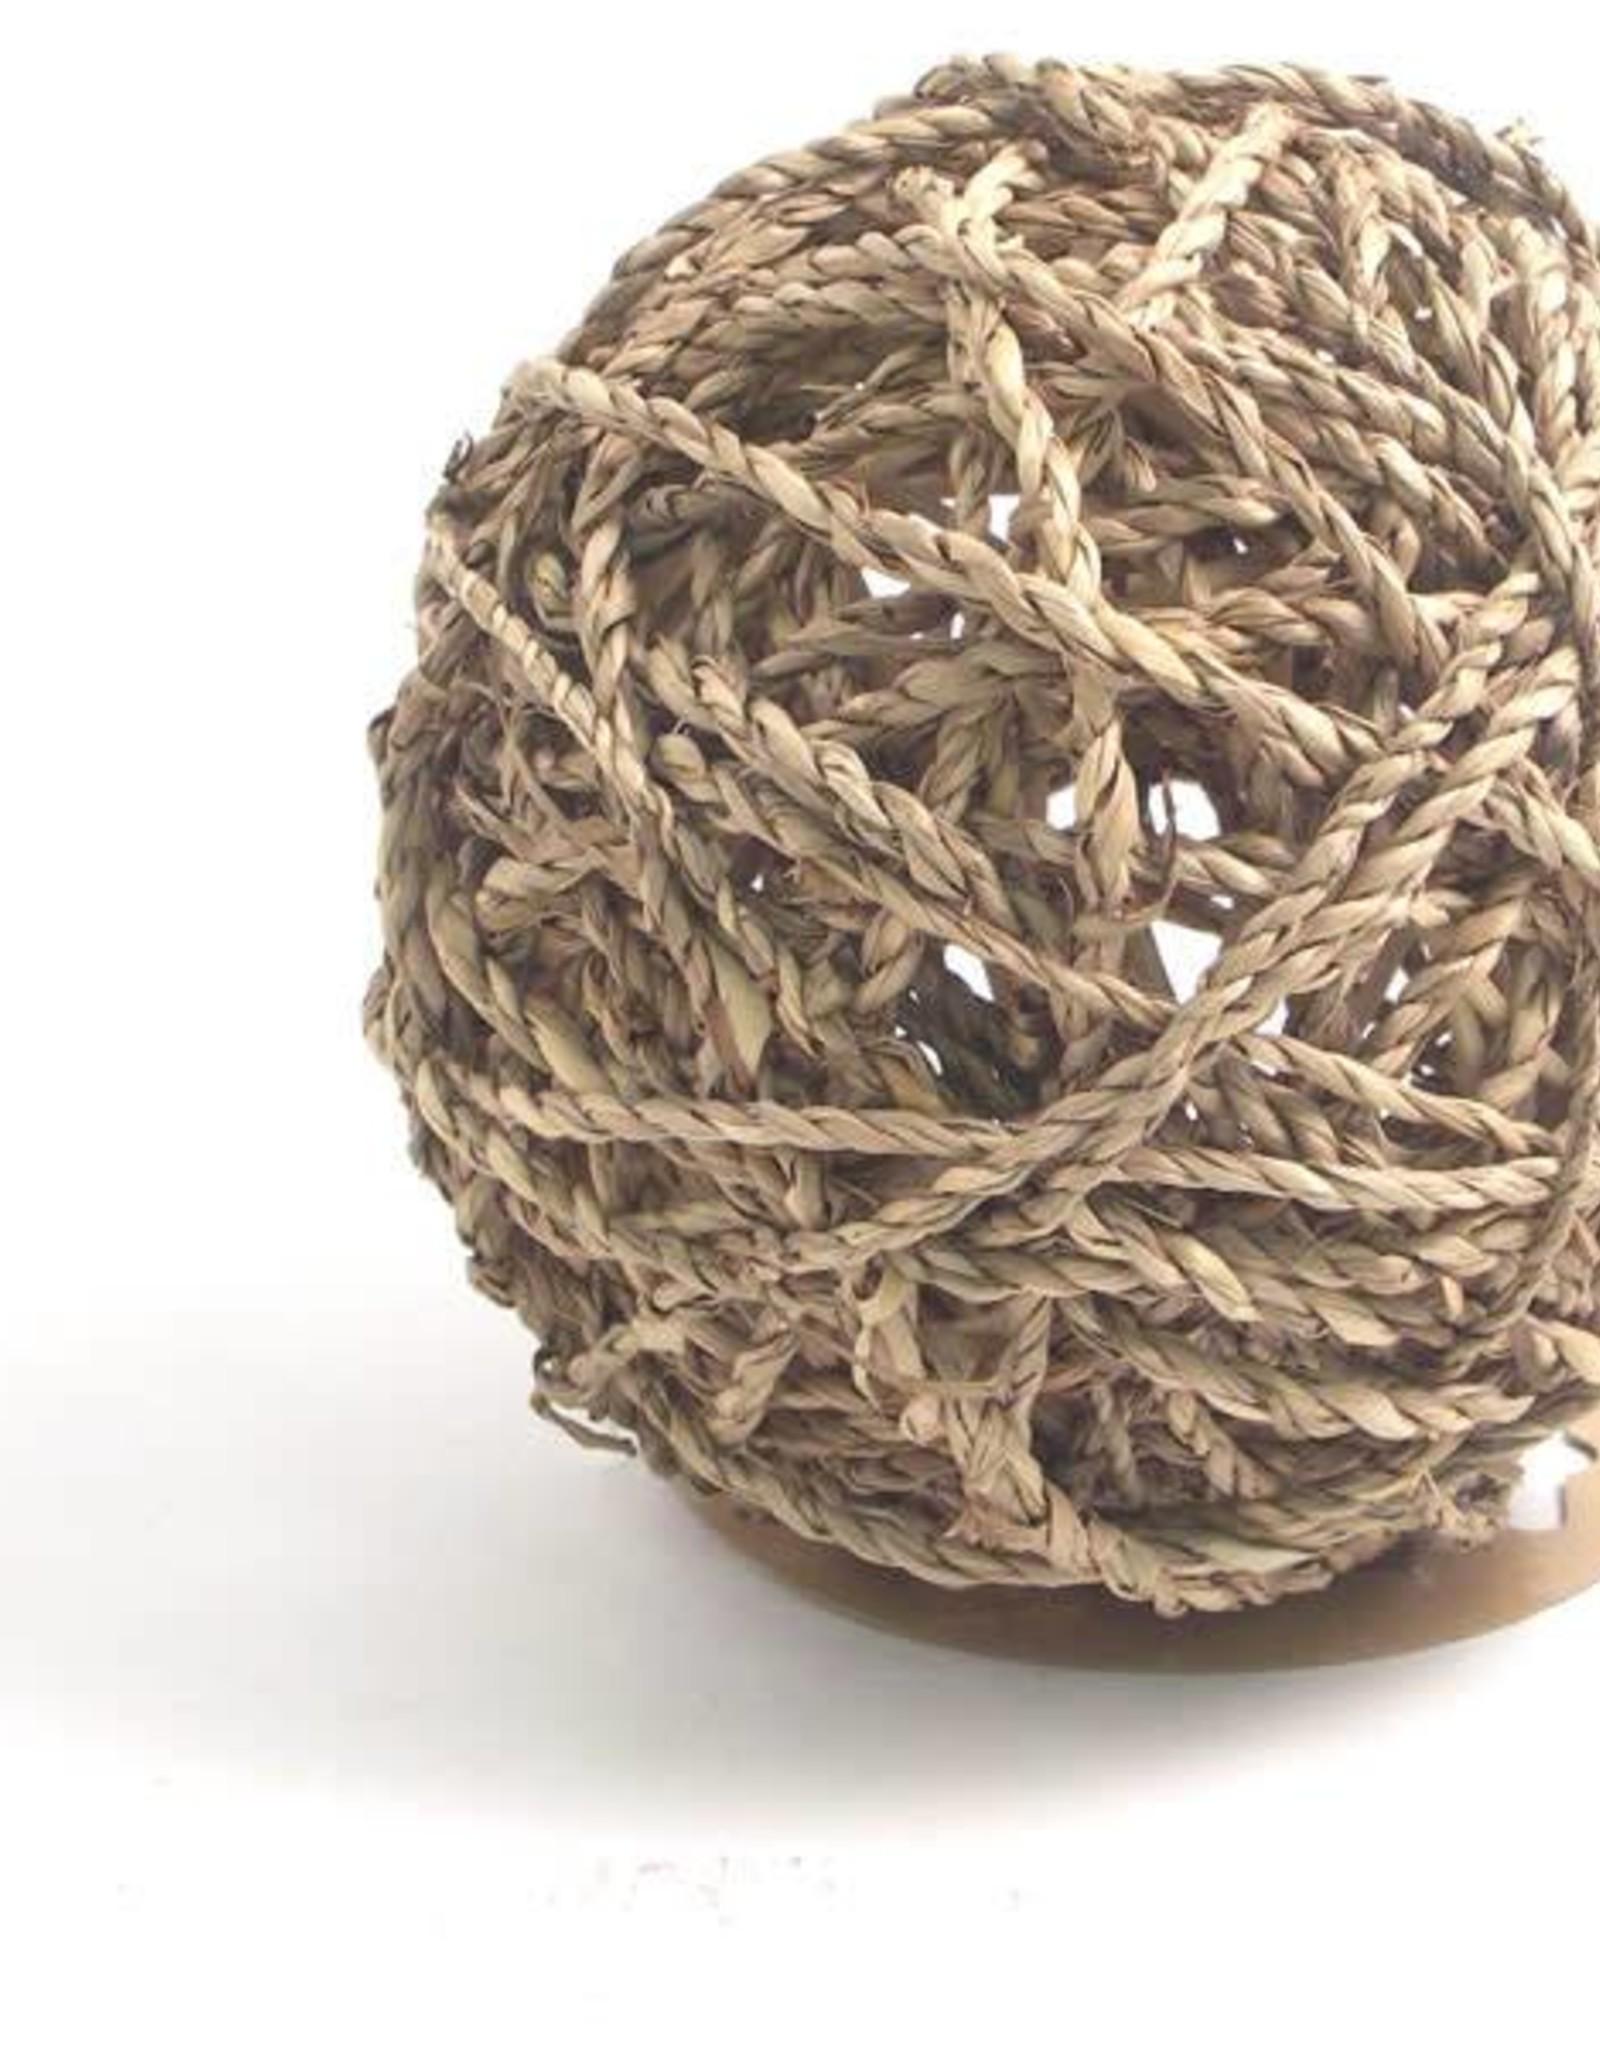 Rosewood Boredom Breaker Sea Grass Fun Ball Small Animal Toy, Large